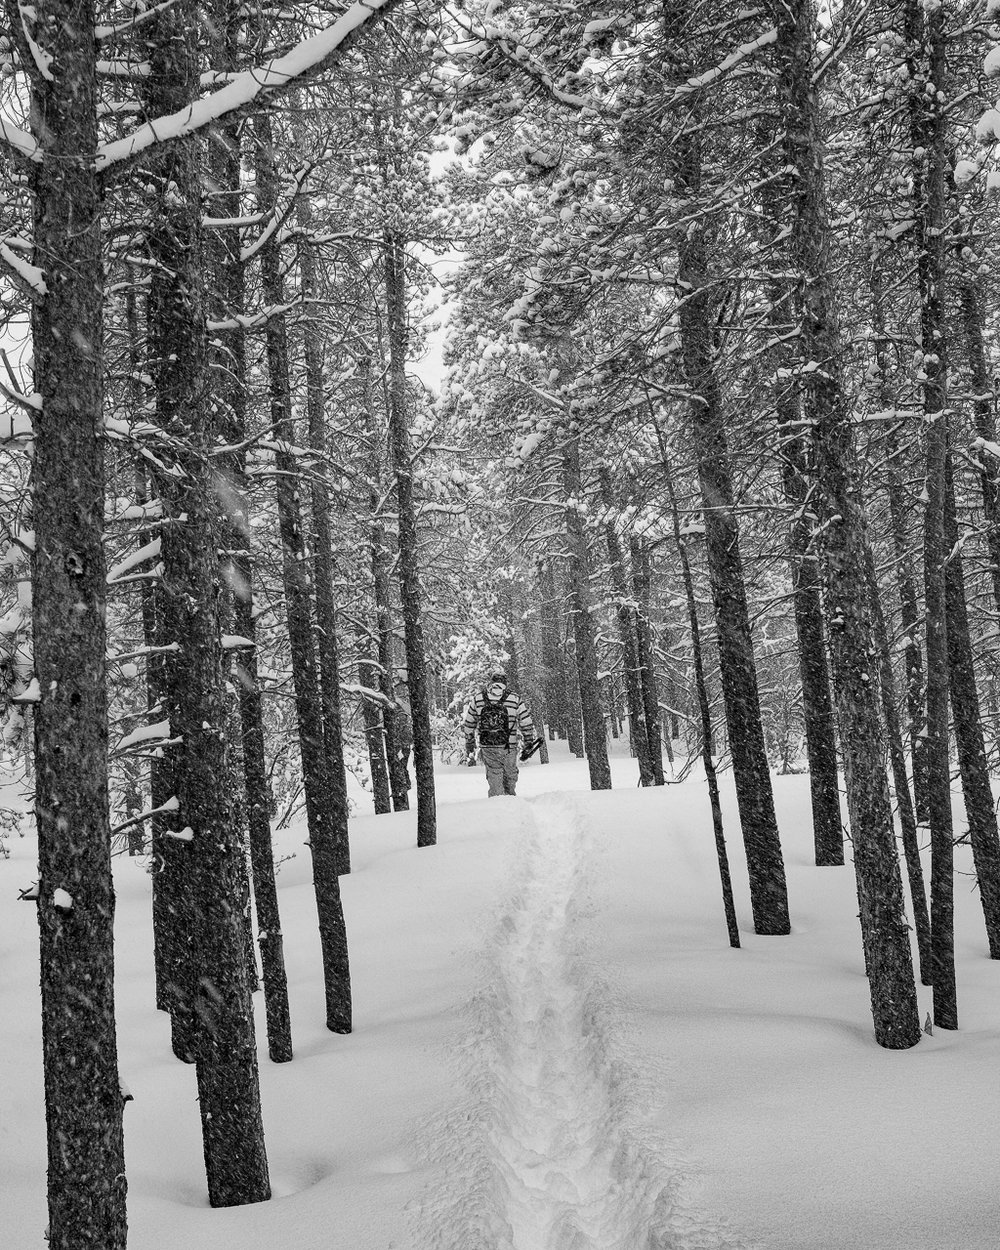 Forging through the snow